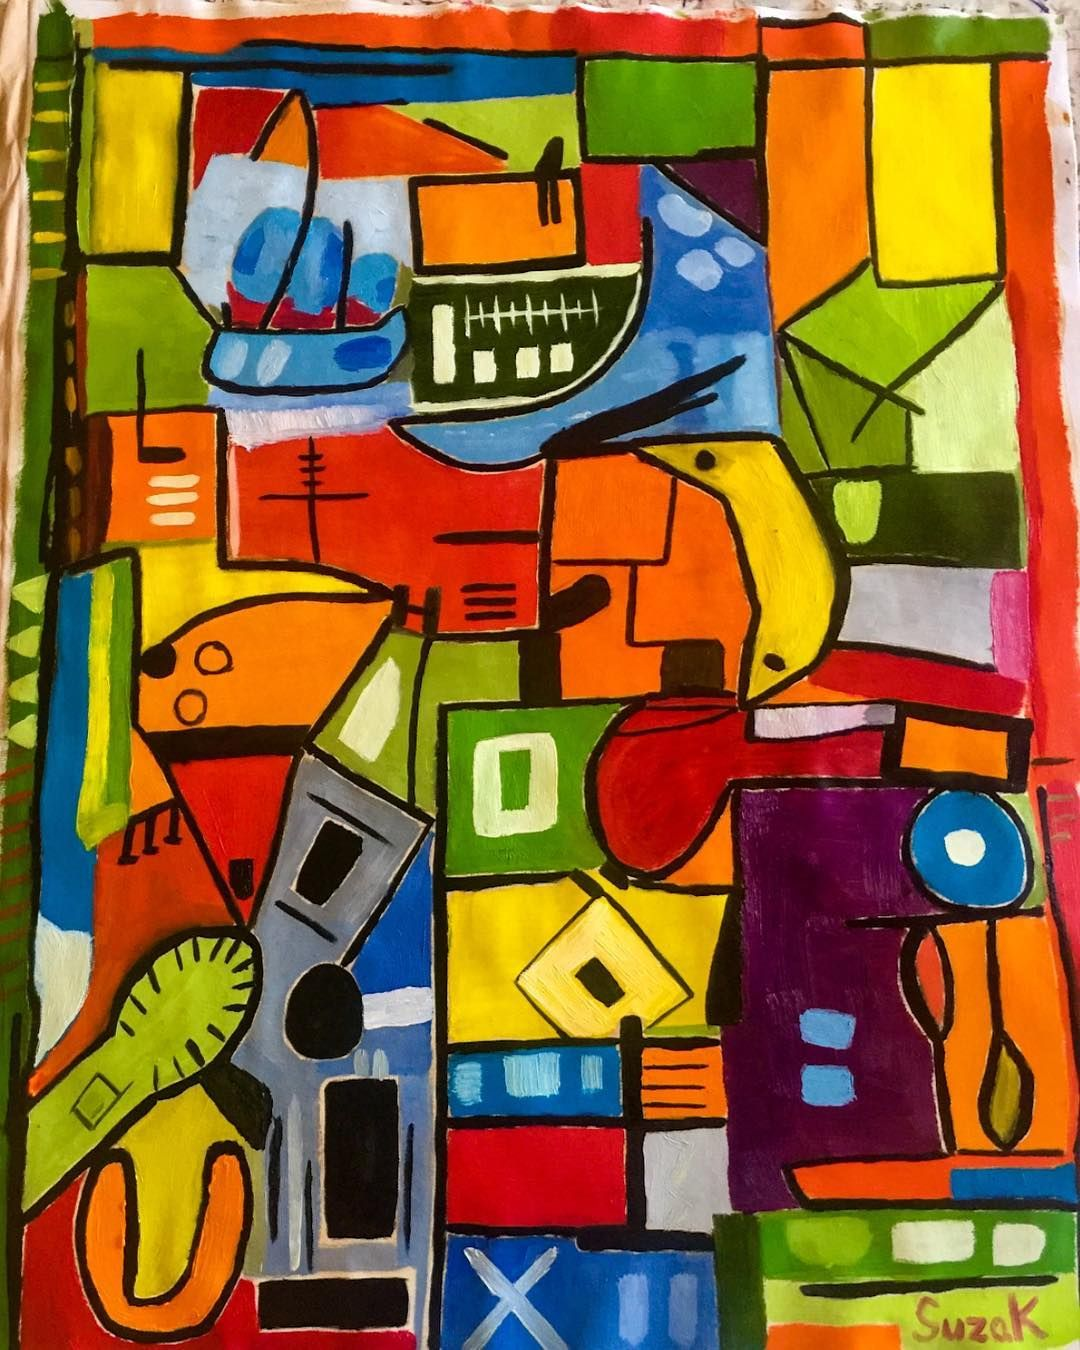 @suzakart, #instaart #instagram #instagood #oilpainting #art #artwork #artist #artgallery #instagood #inspiration #painting #canvas